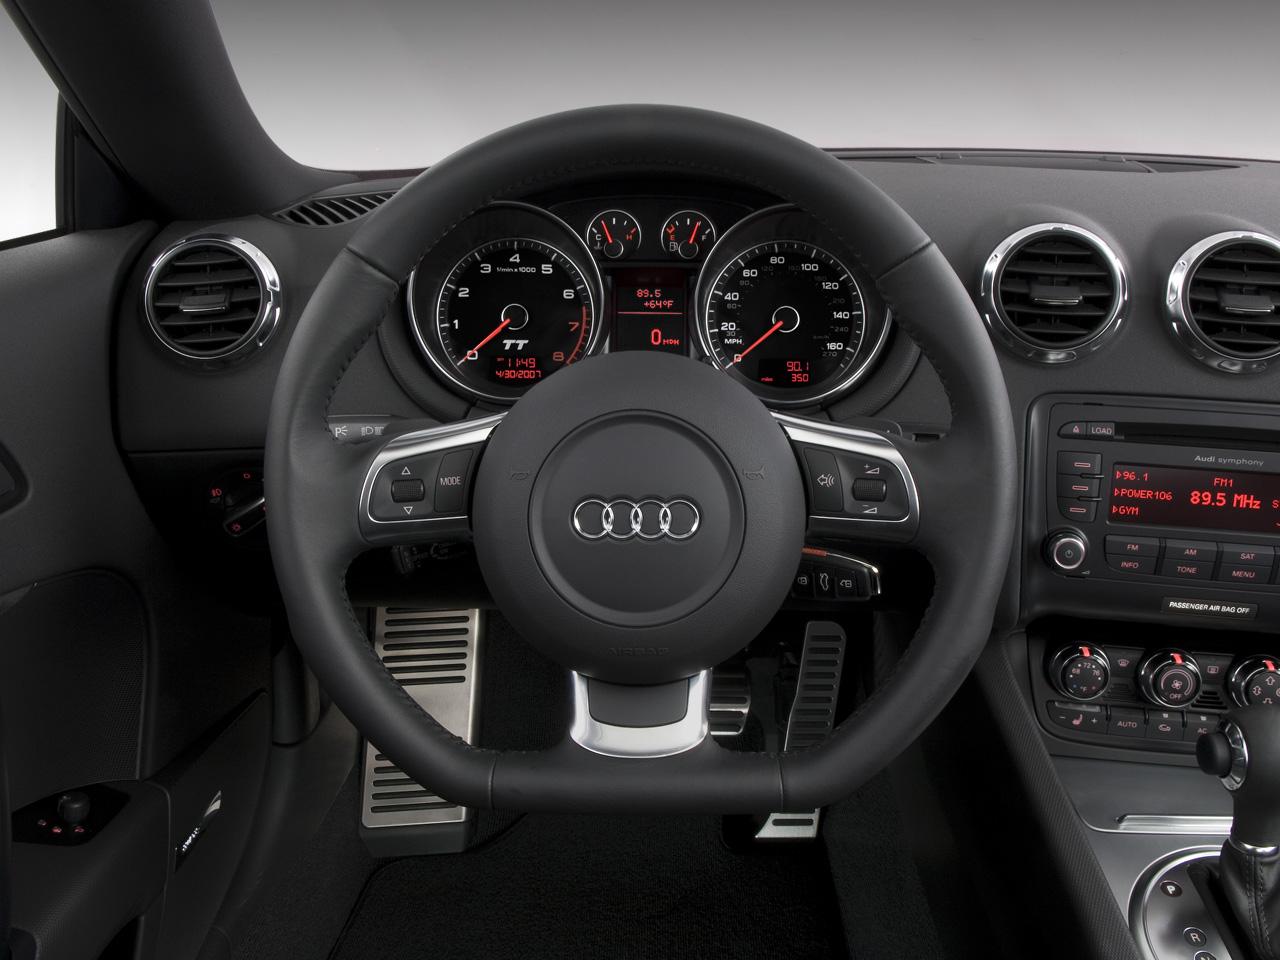 2009 audi tt coupe 2.0 quattro - audi luxury sport coupe review